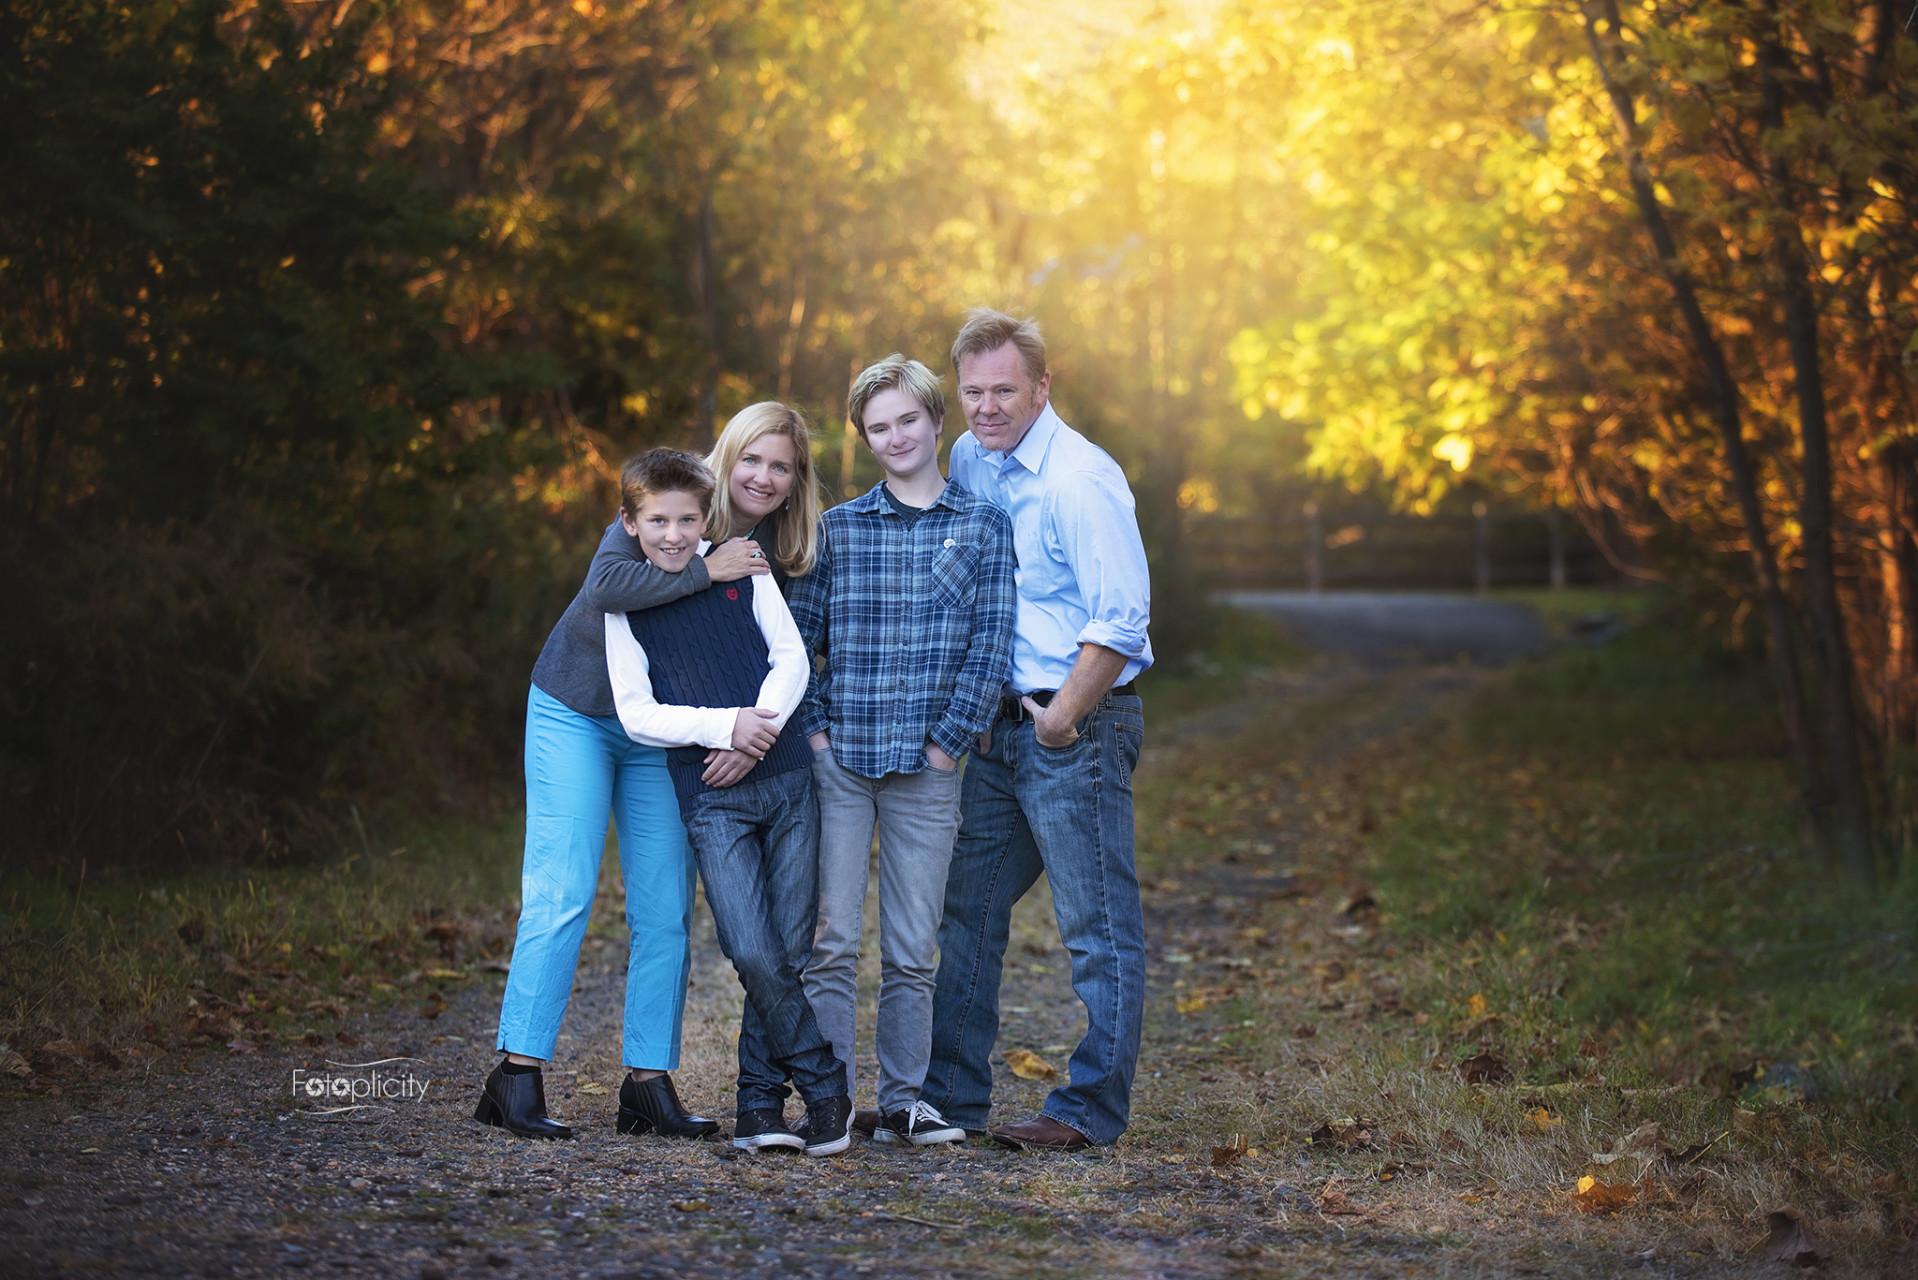 Family portrait Fotoplicity